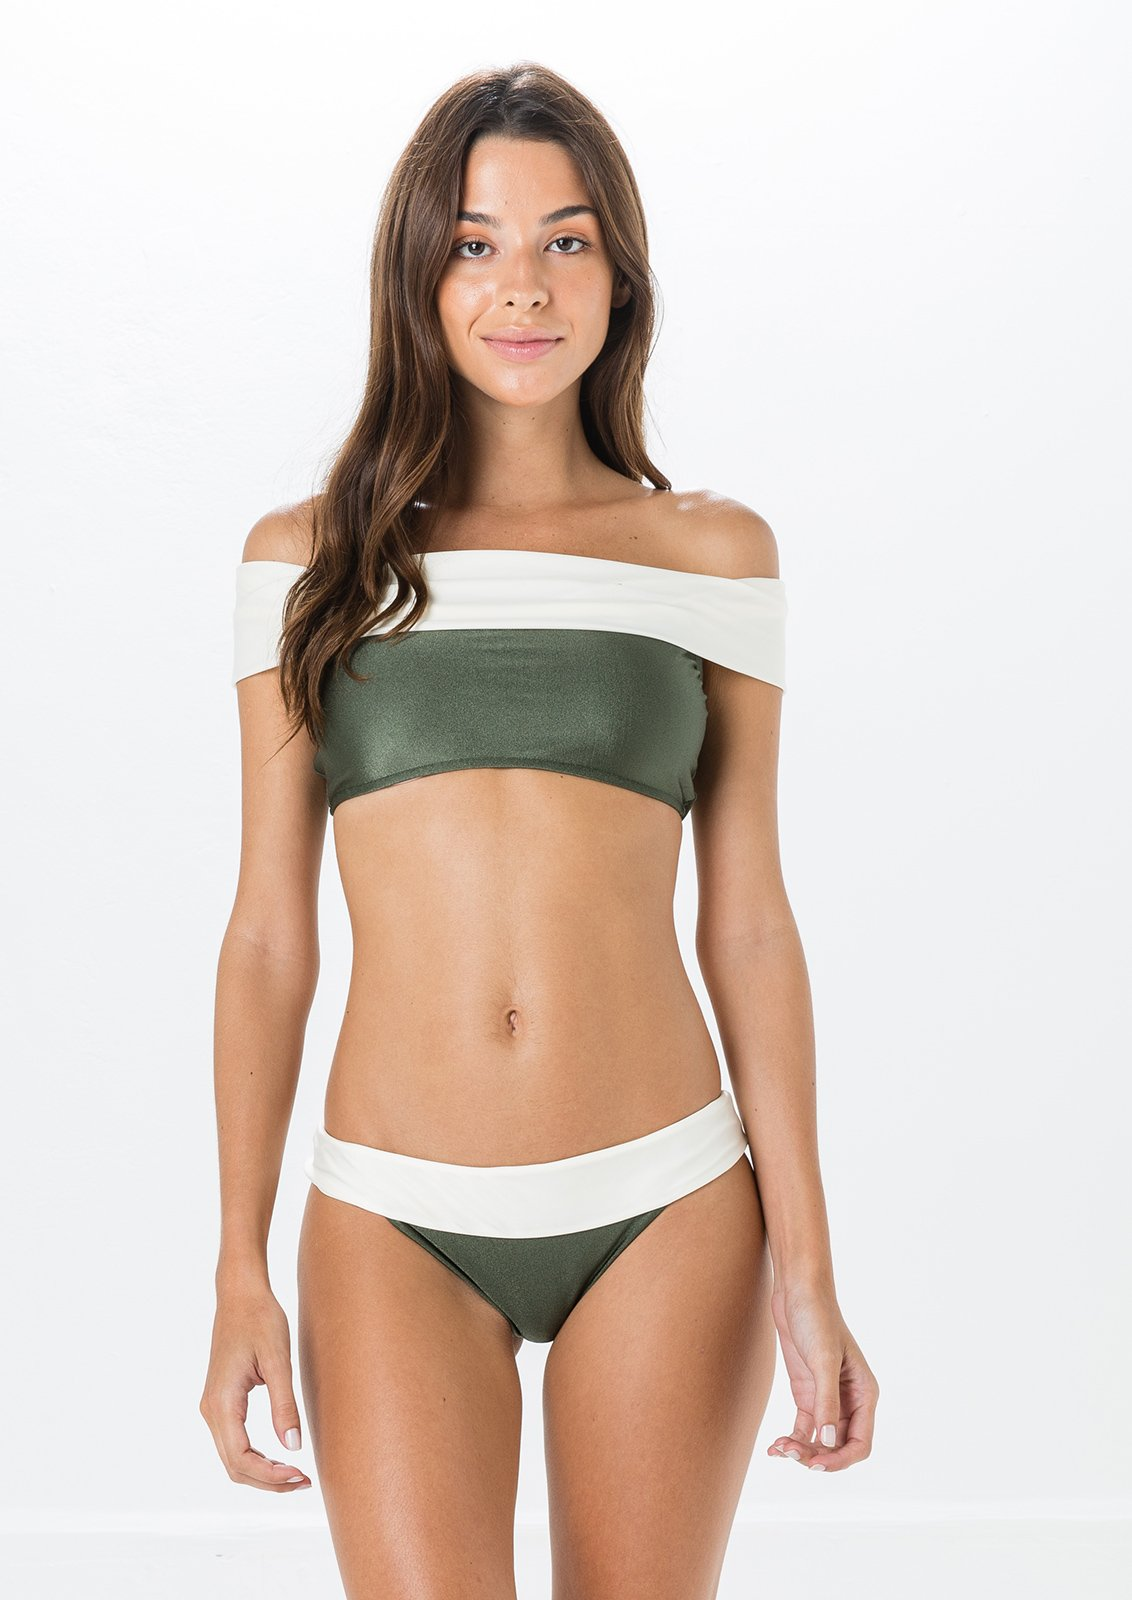 Green and white bikini